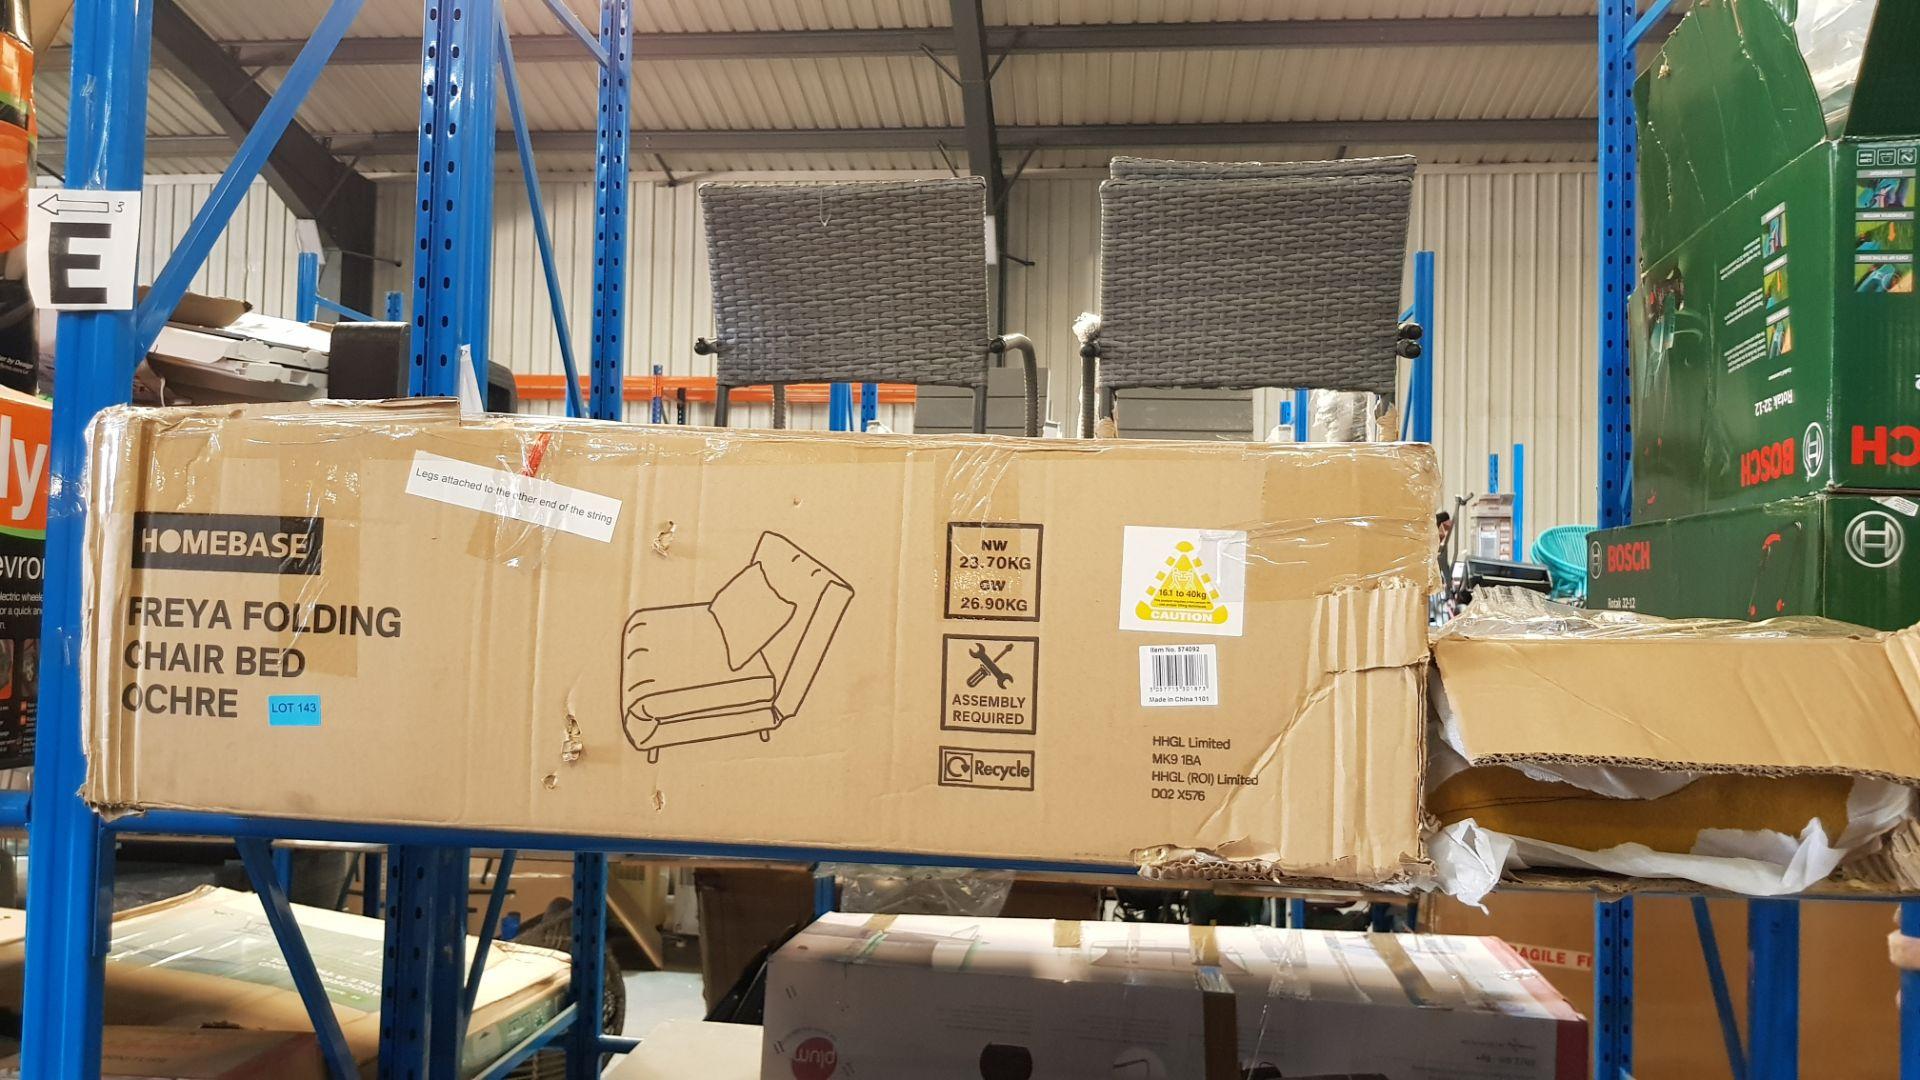 (3D) 1x Freya Folding Chair Bed Ochre. RRP £200.00. - Image 3 of 3